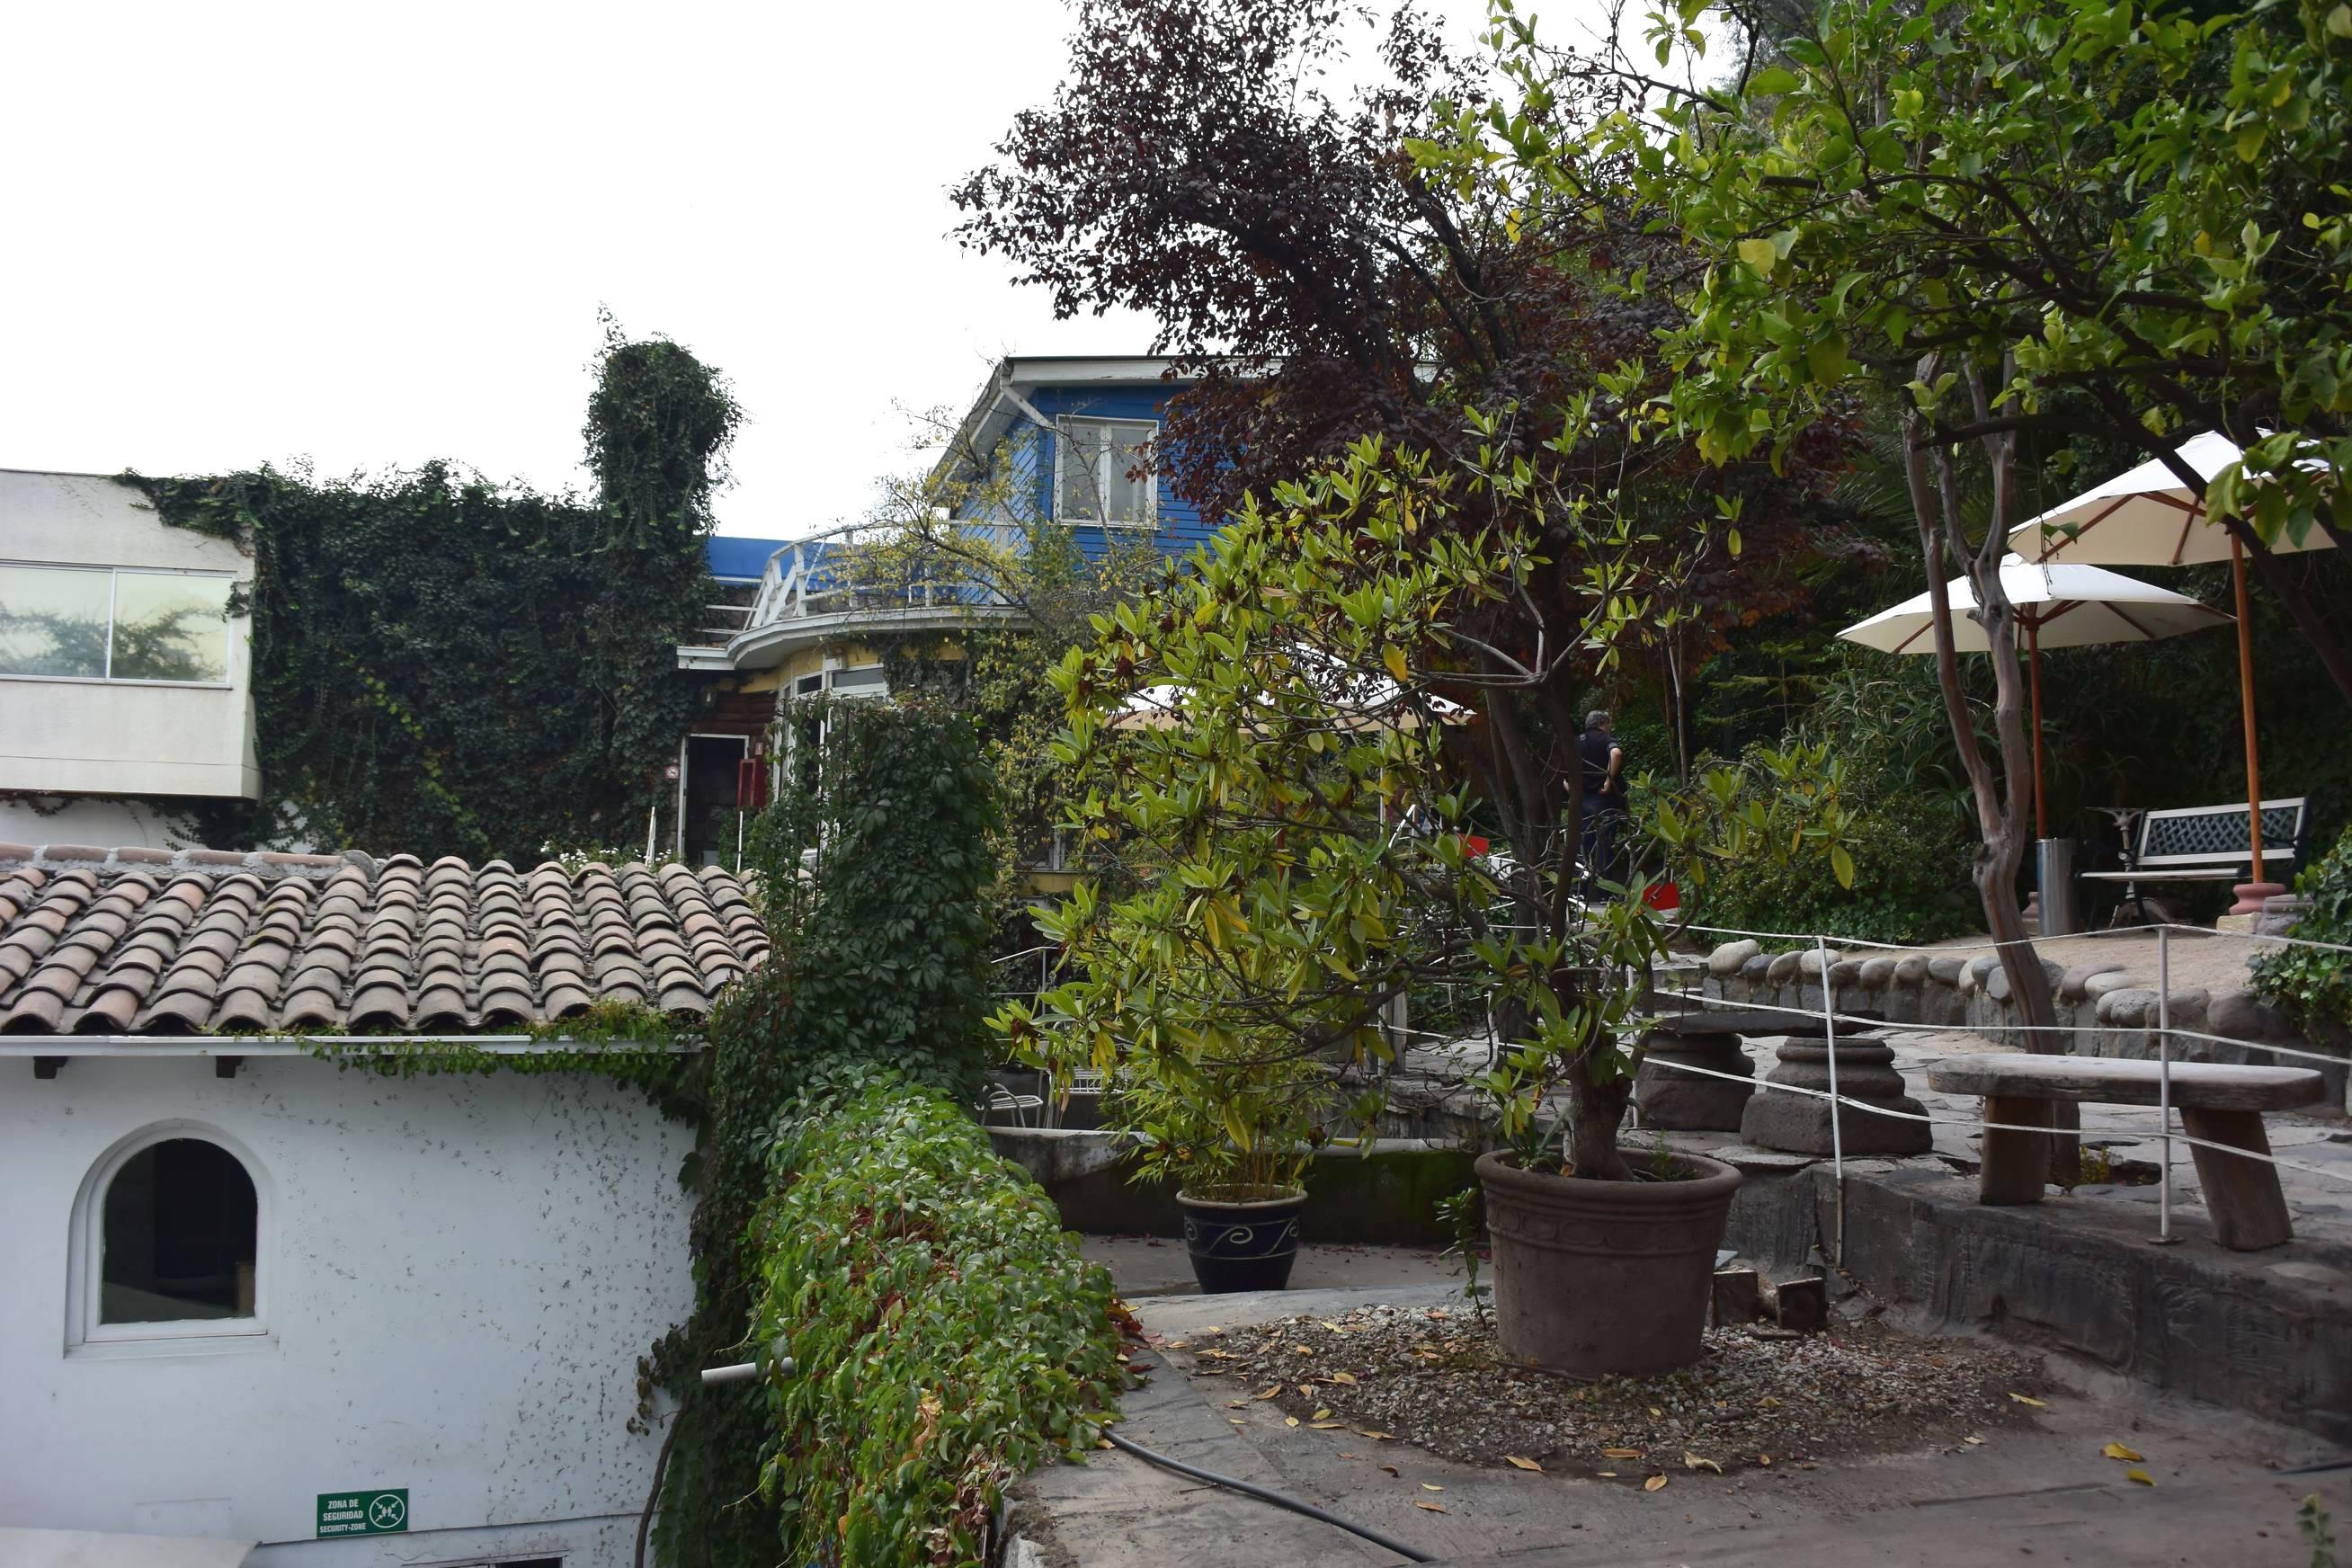 Maison de Pablo Neruda Santiago 2